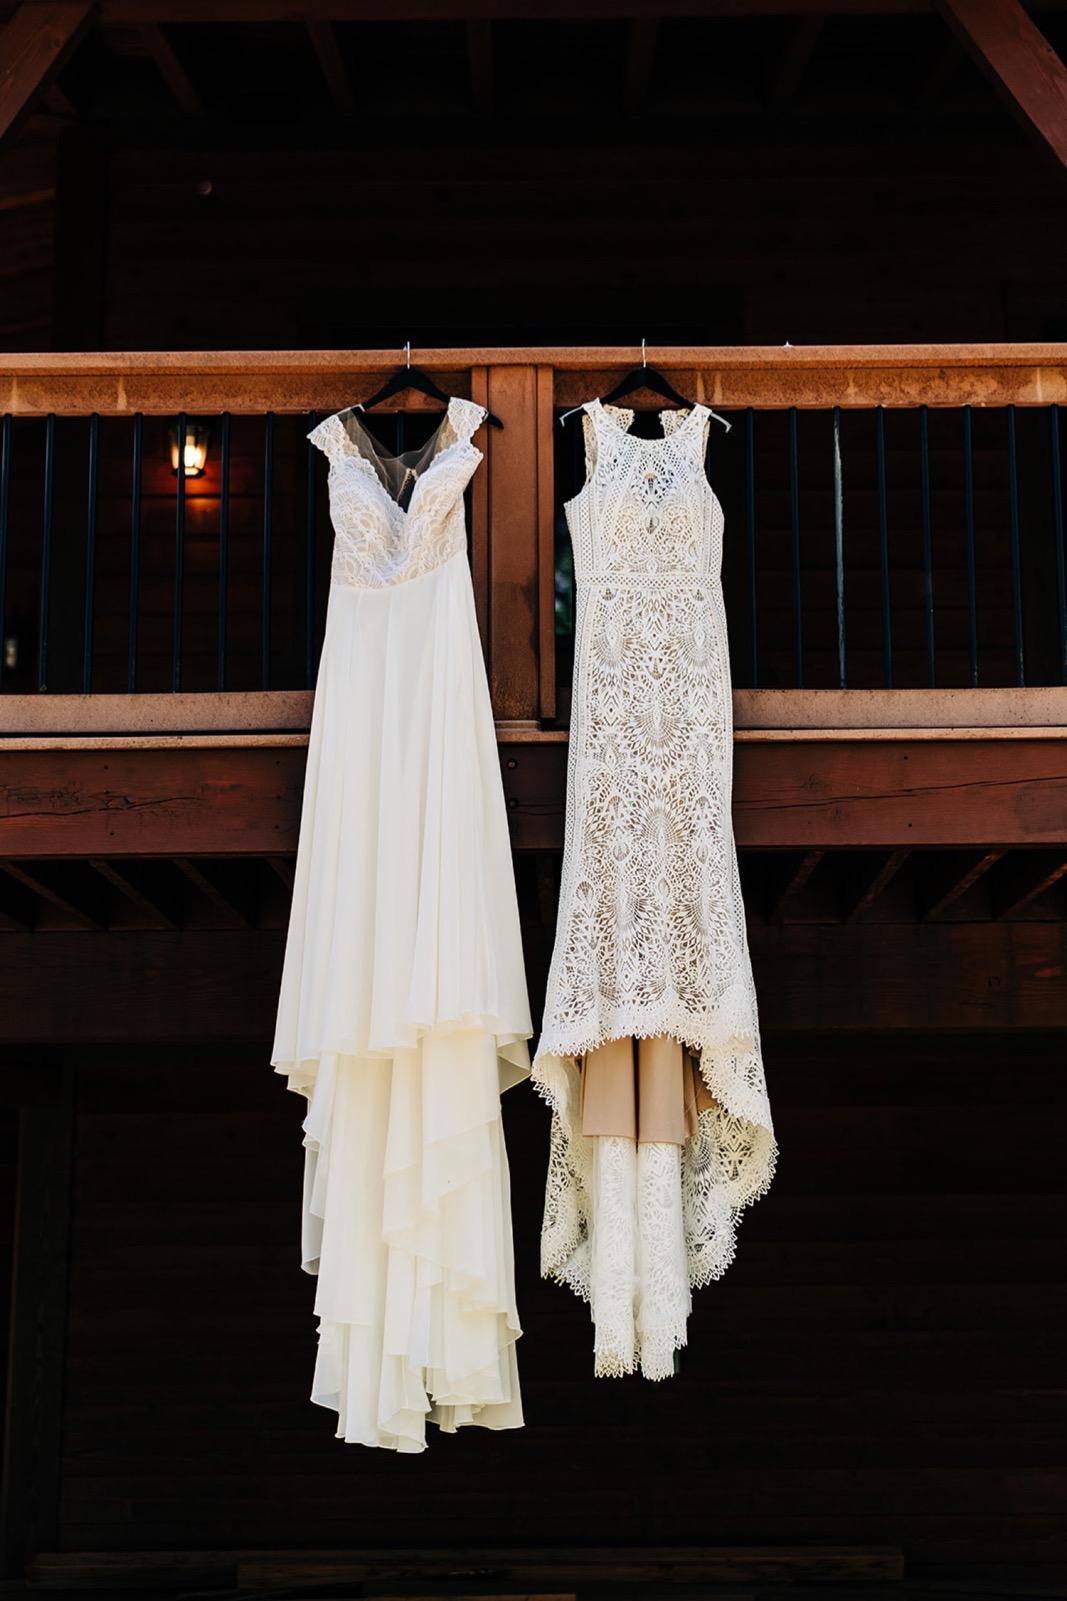 014_falissa_heather_wedding-32.jpg